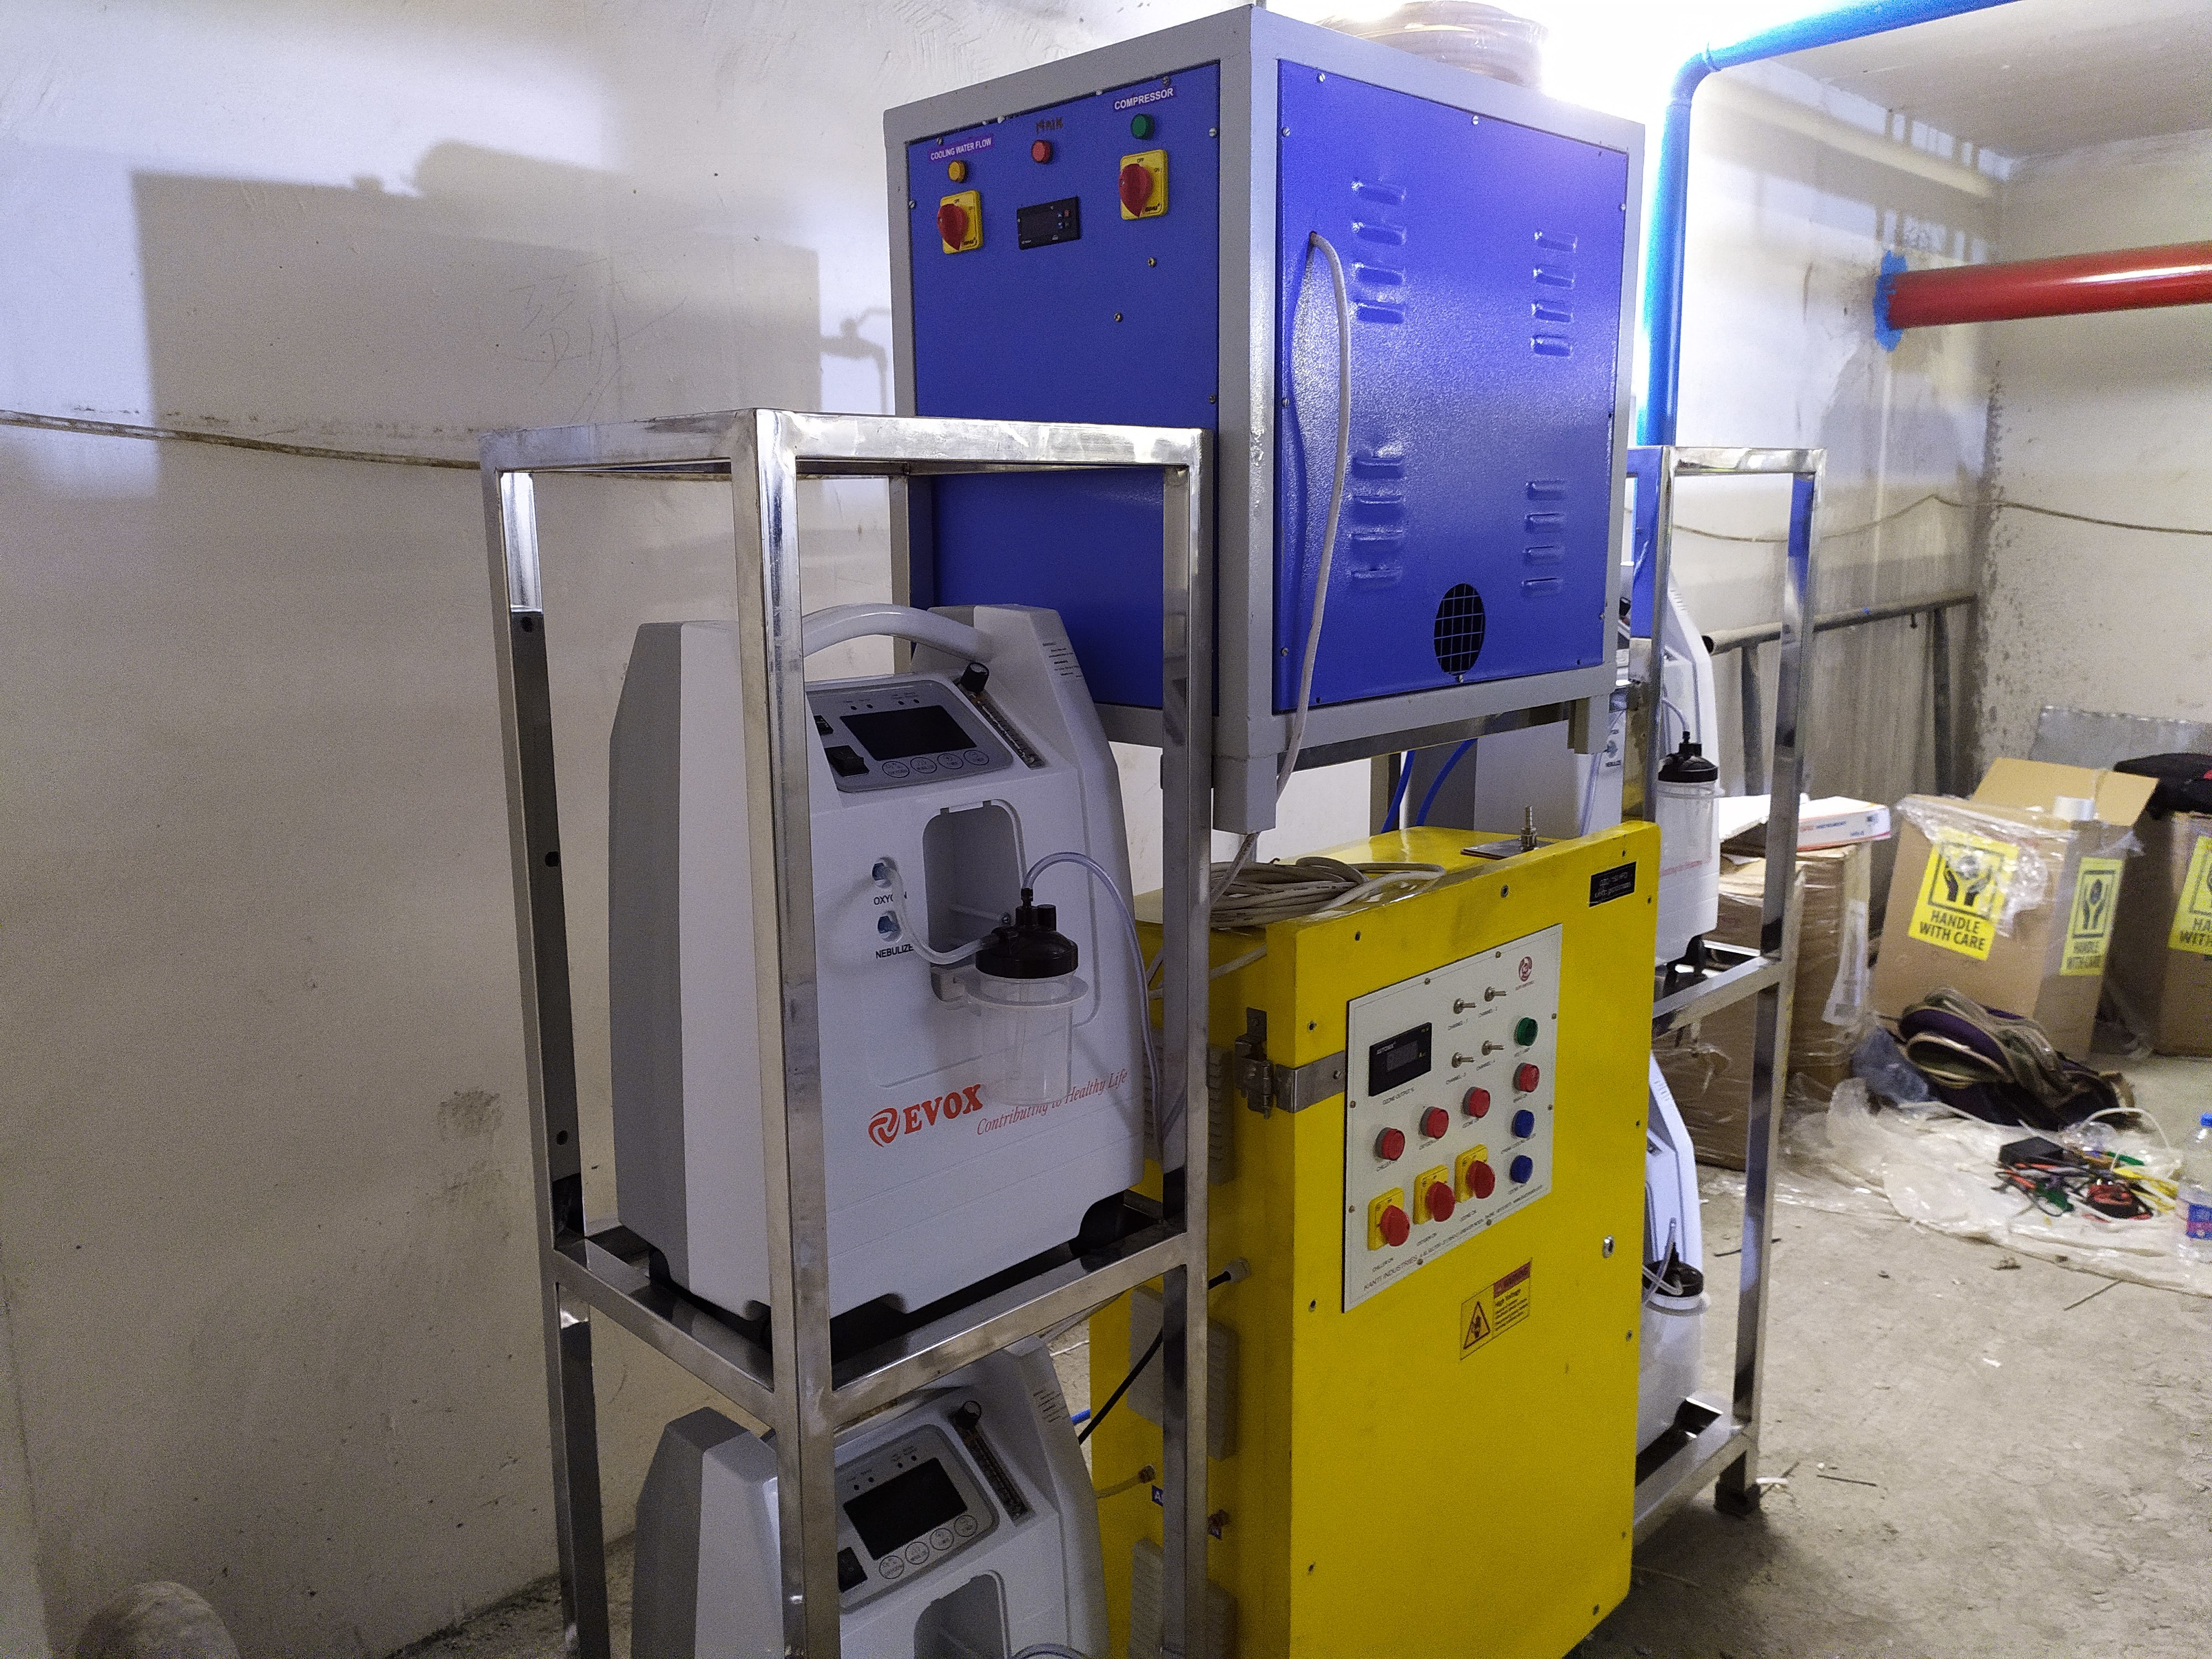 200 gm/hr臭氧发电器